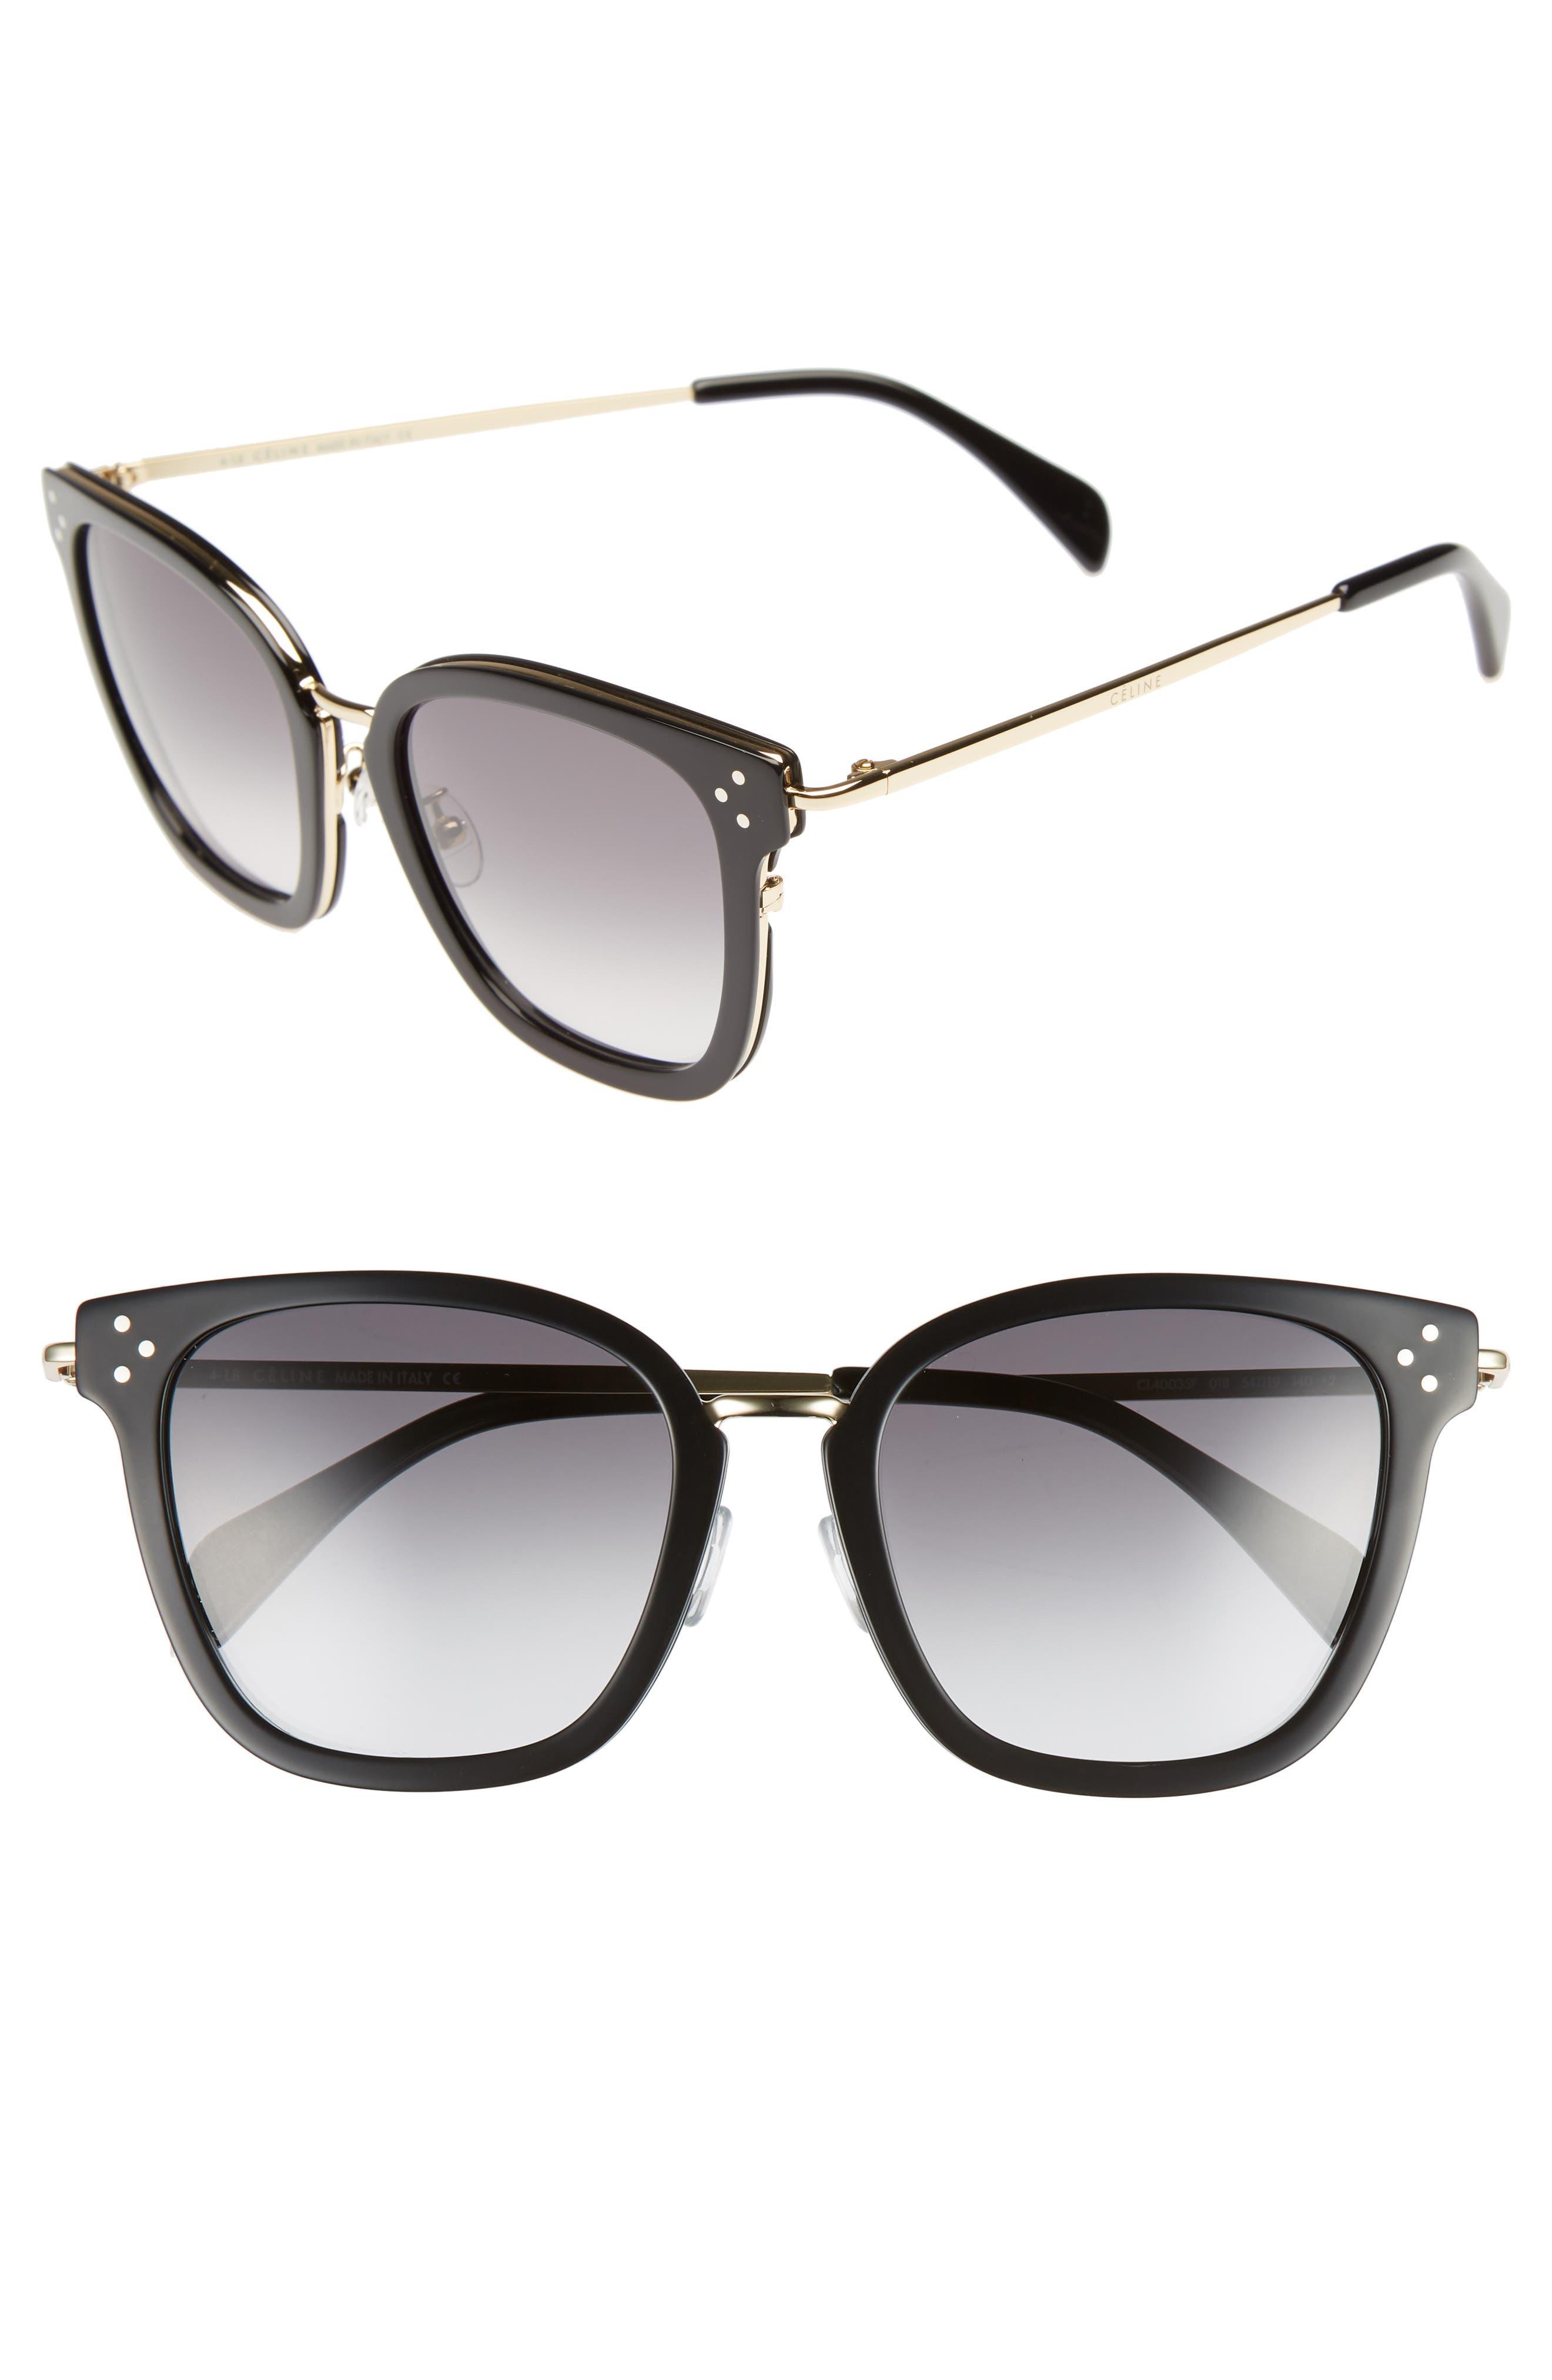 CELINE,                             Special Fit 54mm Sunglasses,                             Main thumbnail 1, color,                             BLACK/ GOLD/ SMOKE